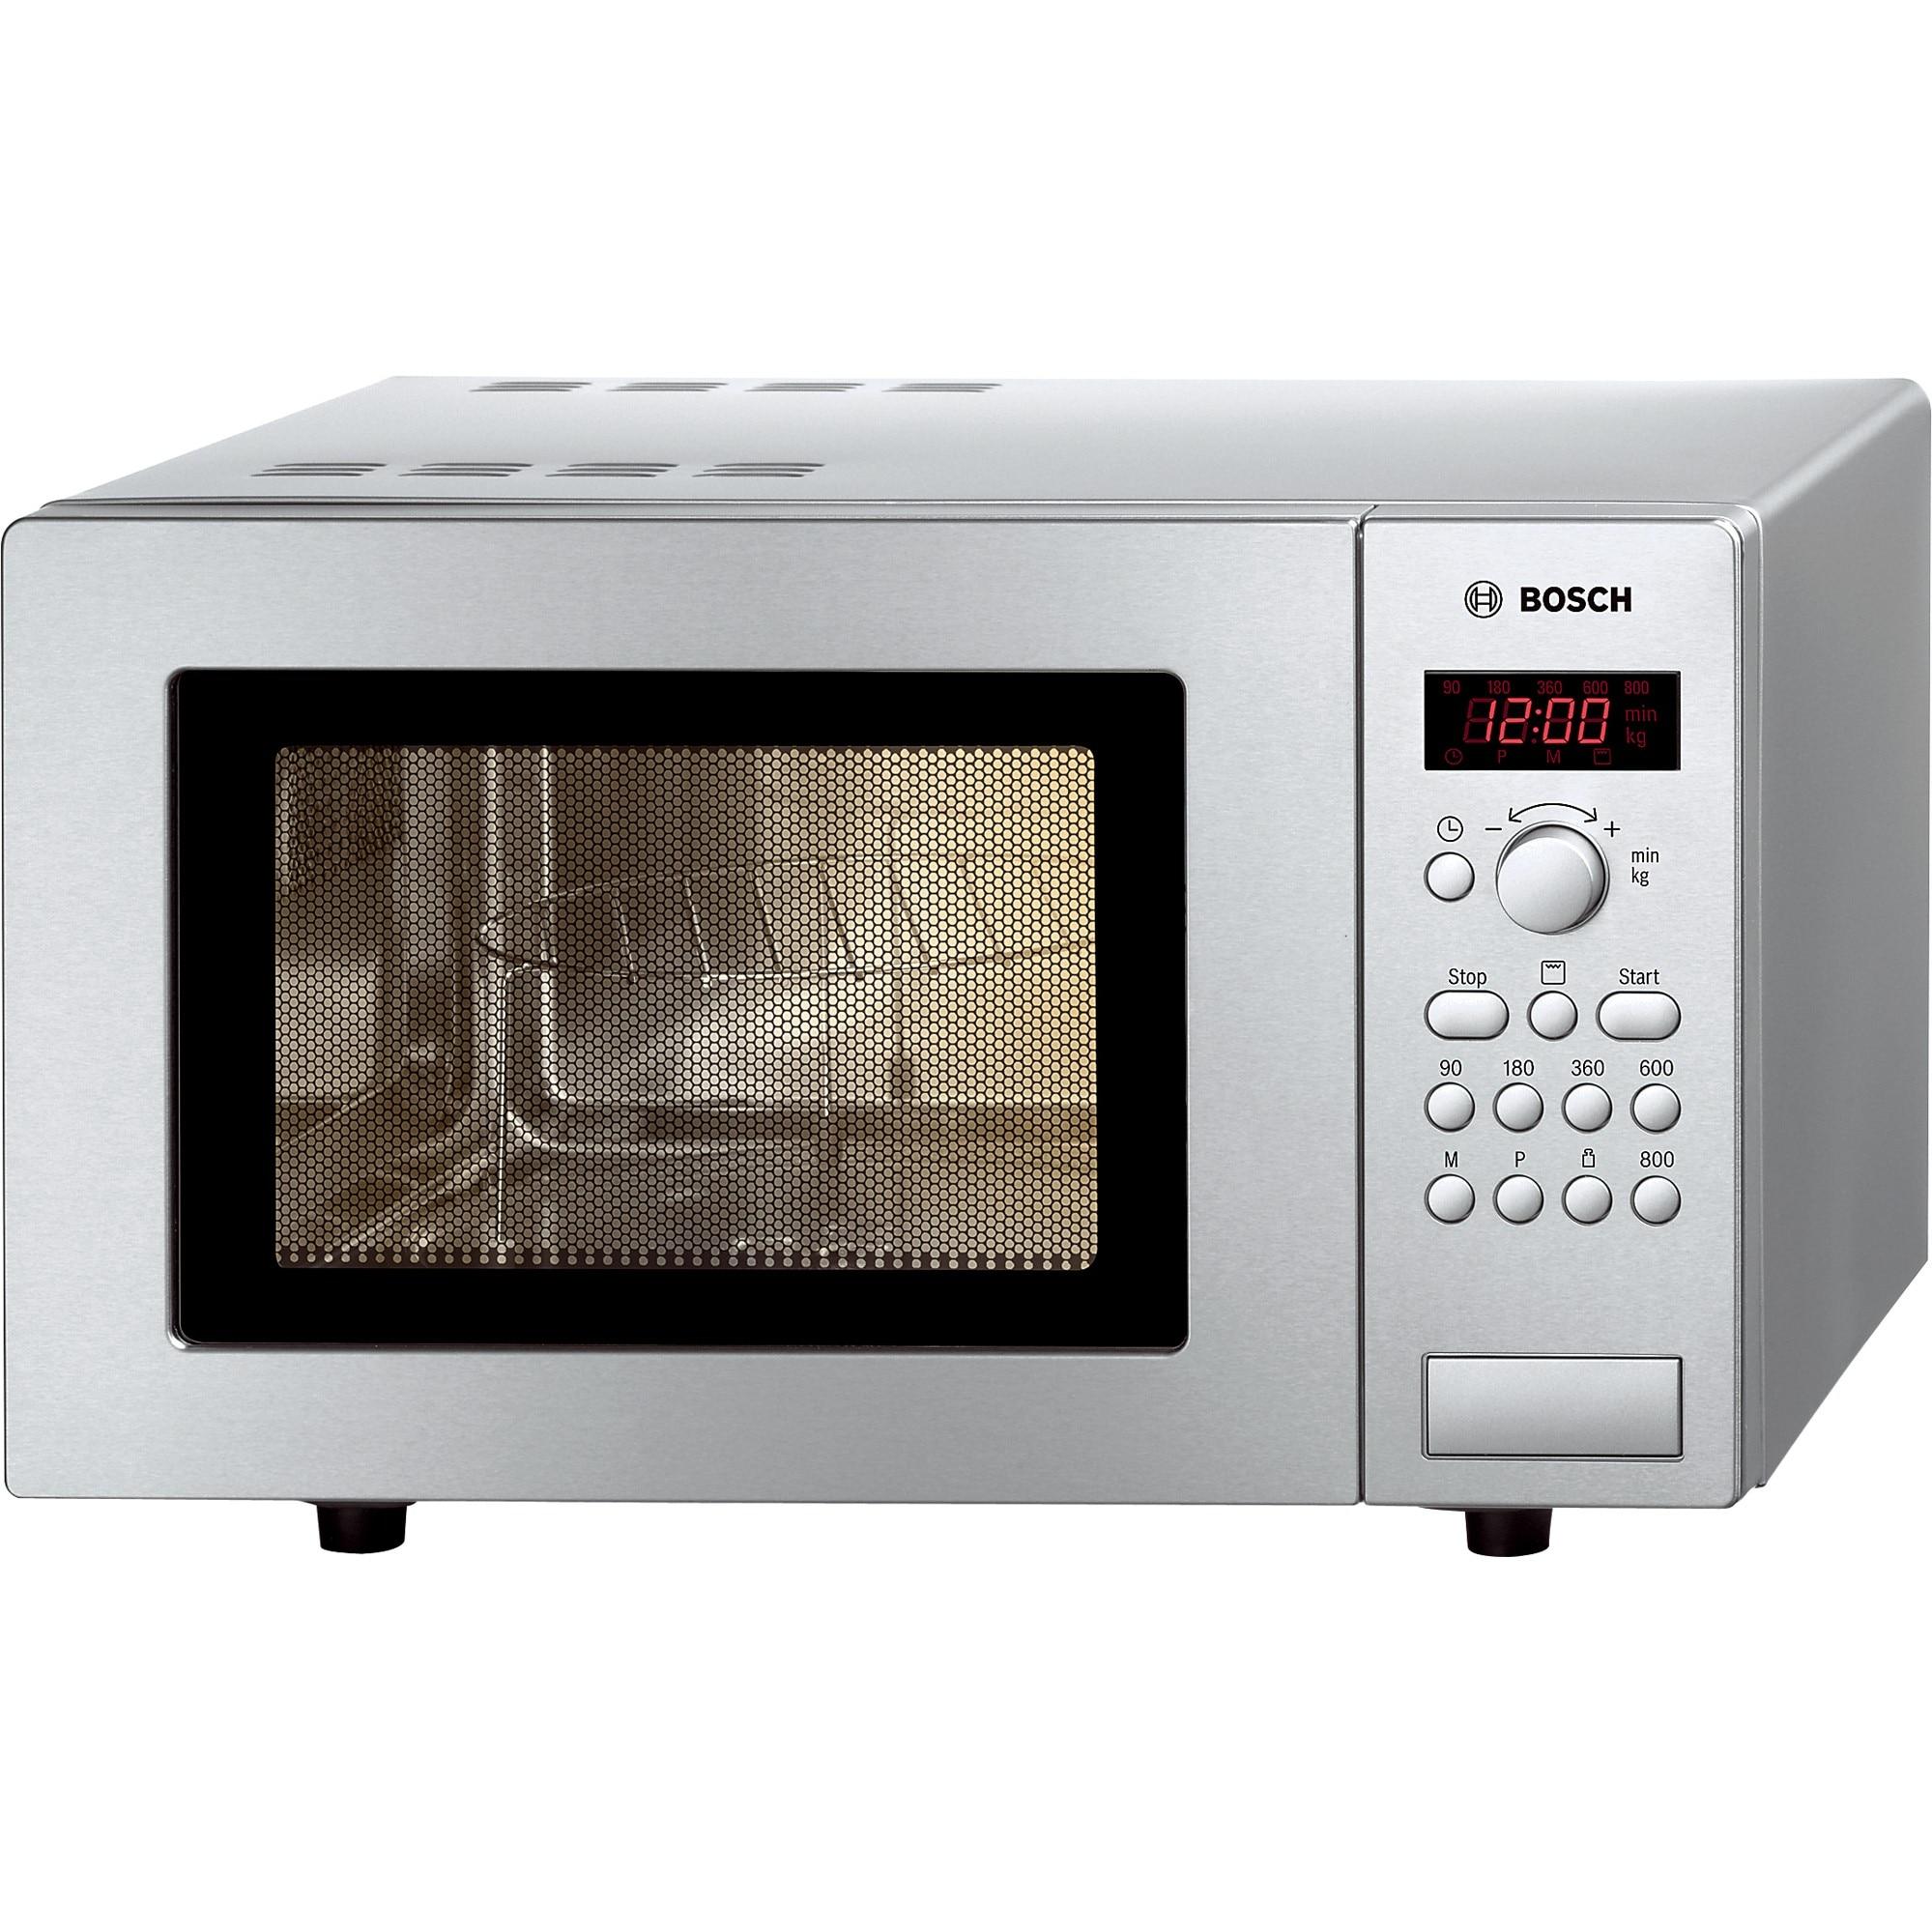 Fotografie Cuptor cu microunde Bosch HMT75G451, grill 1000 W, microunde 800 W, 17 L, dezghetare, Display,